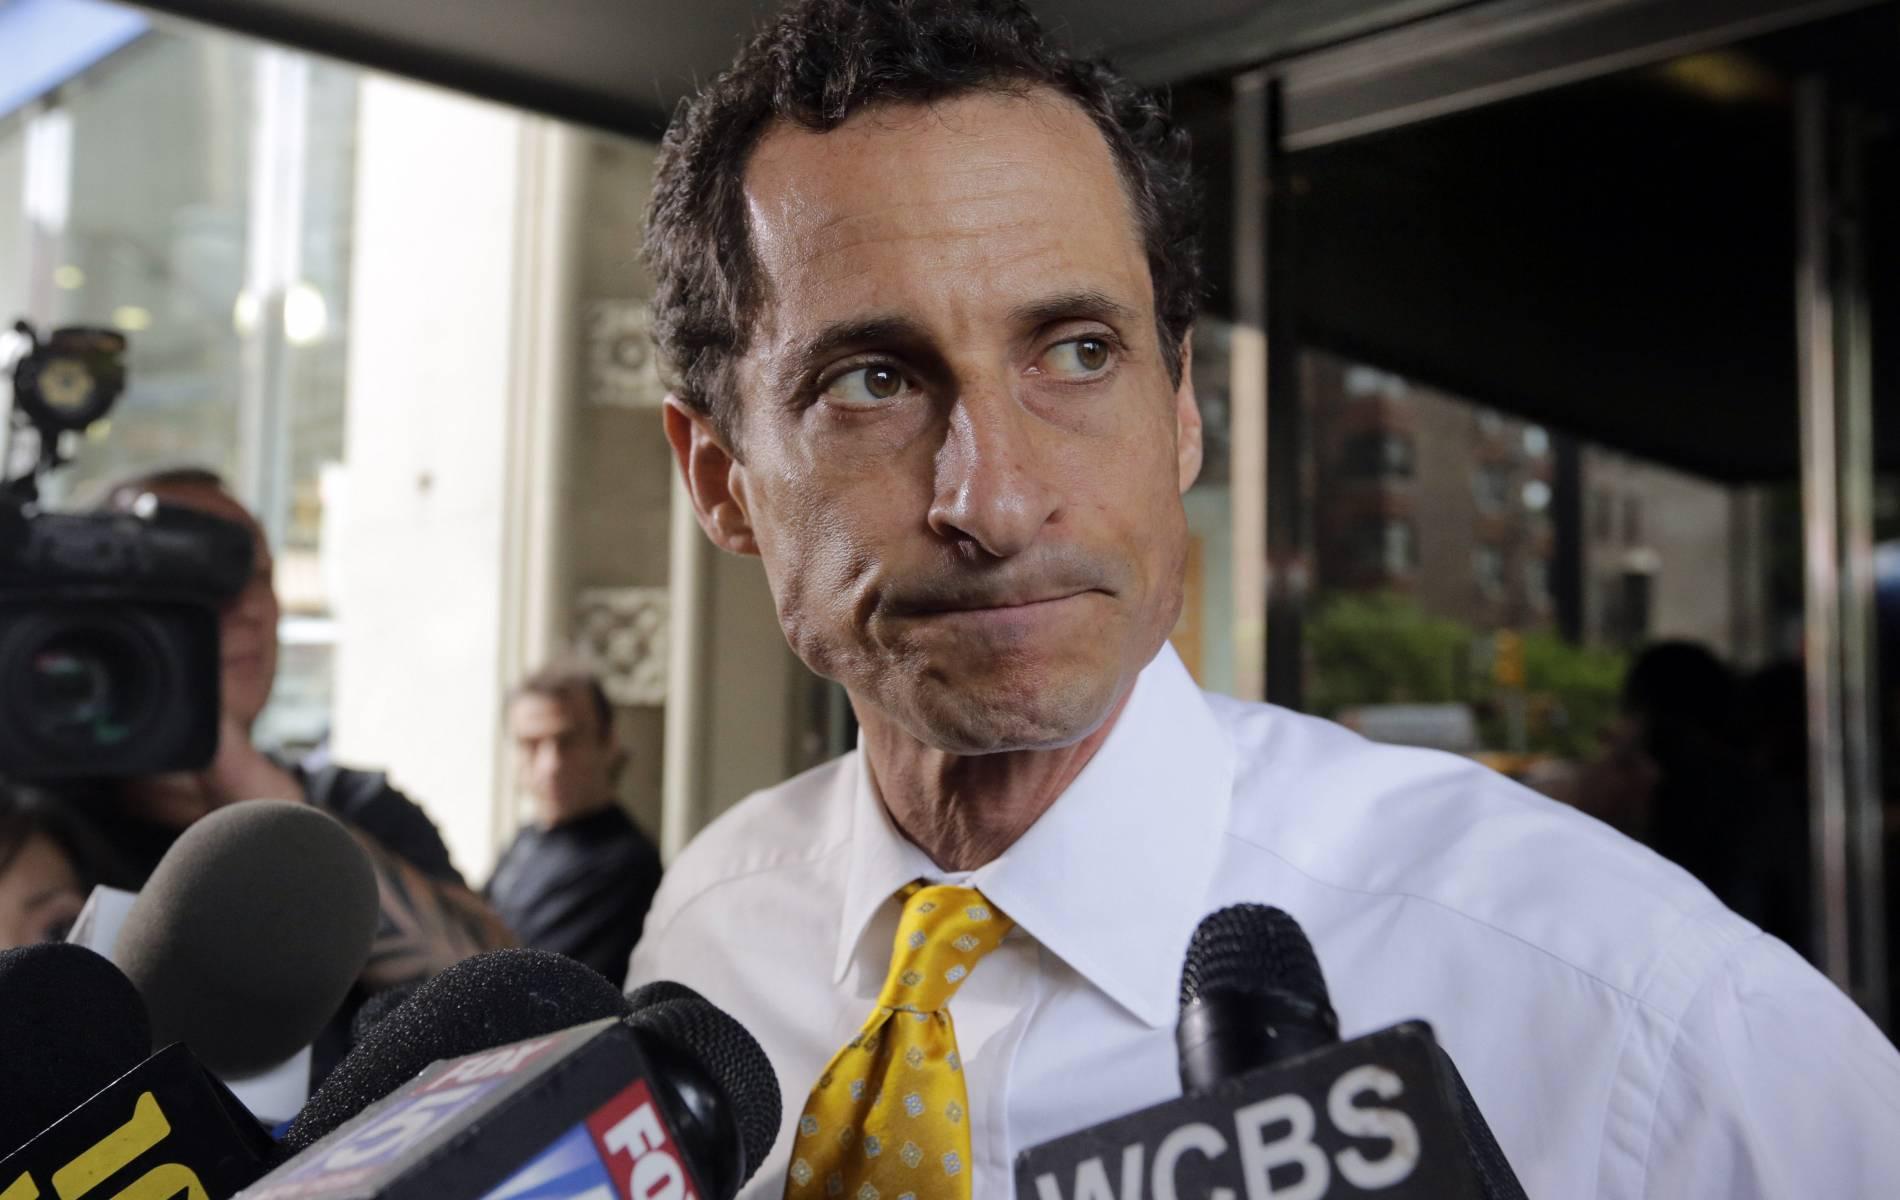 Anthony Weiner sentenced to 21 months in prison